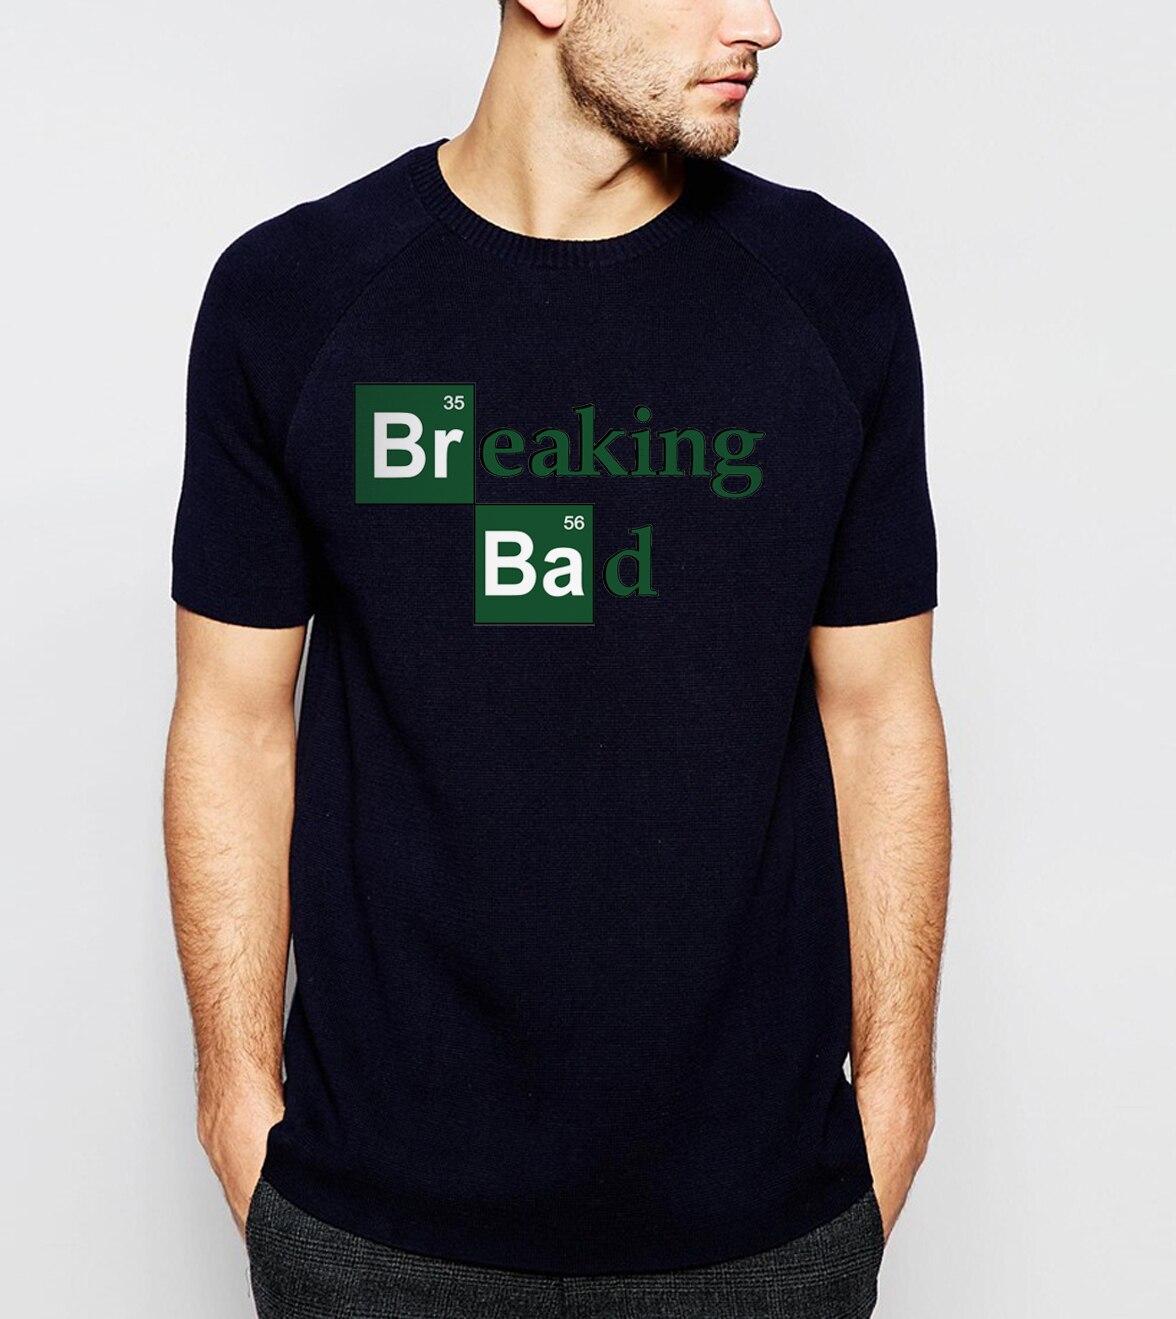 Hot Sale Breaking Bad Heisenberg Men T Shirts 2019 Summer Fashion Casual 100% Cotton  T-Shirt Streetwear Slim Fit Top Tees S-3XL